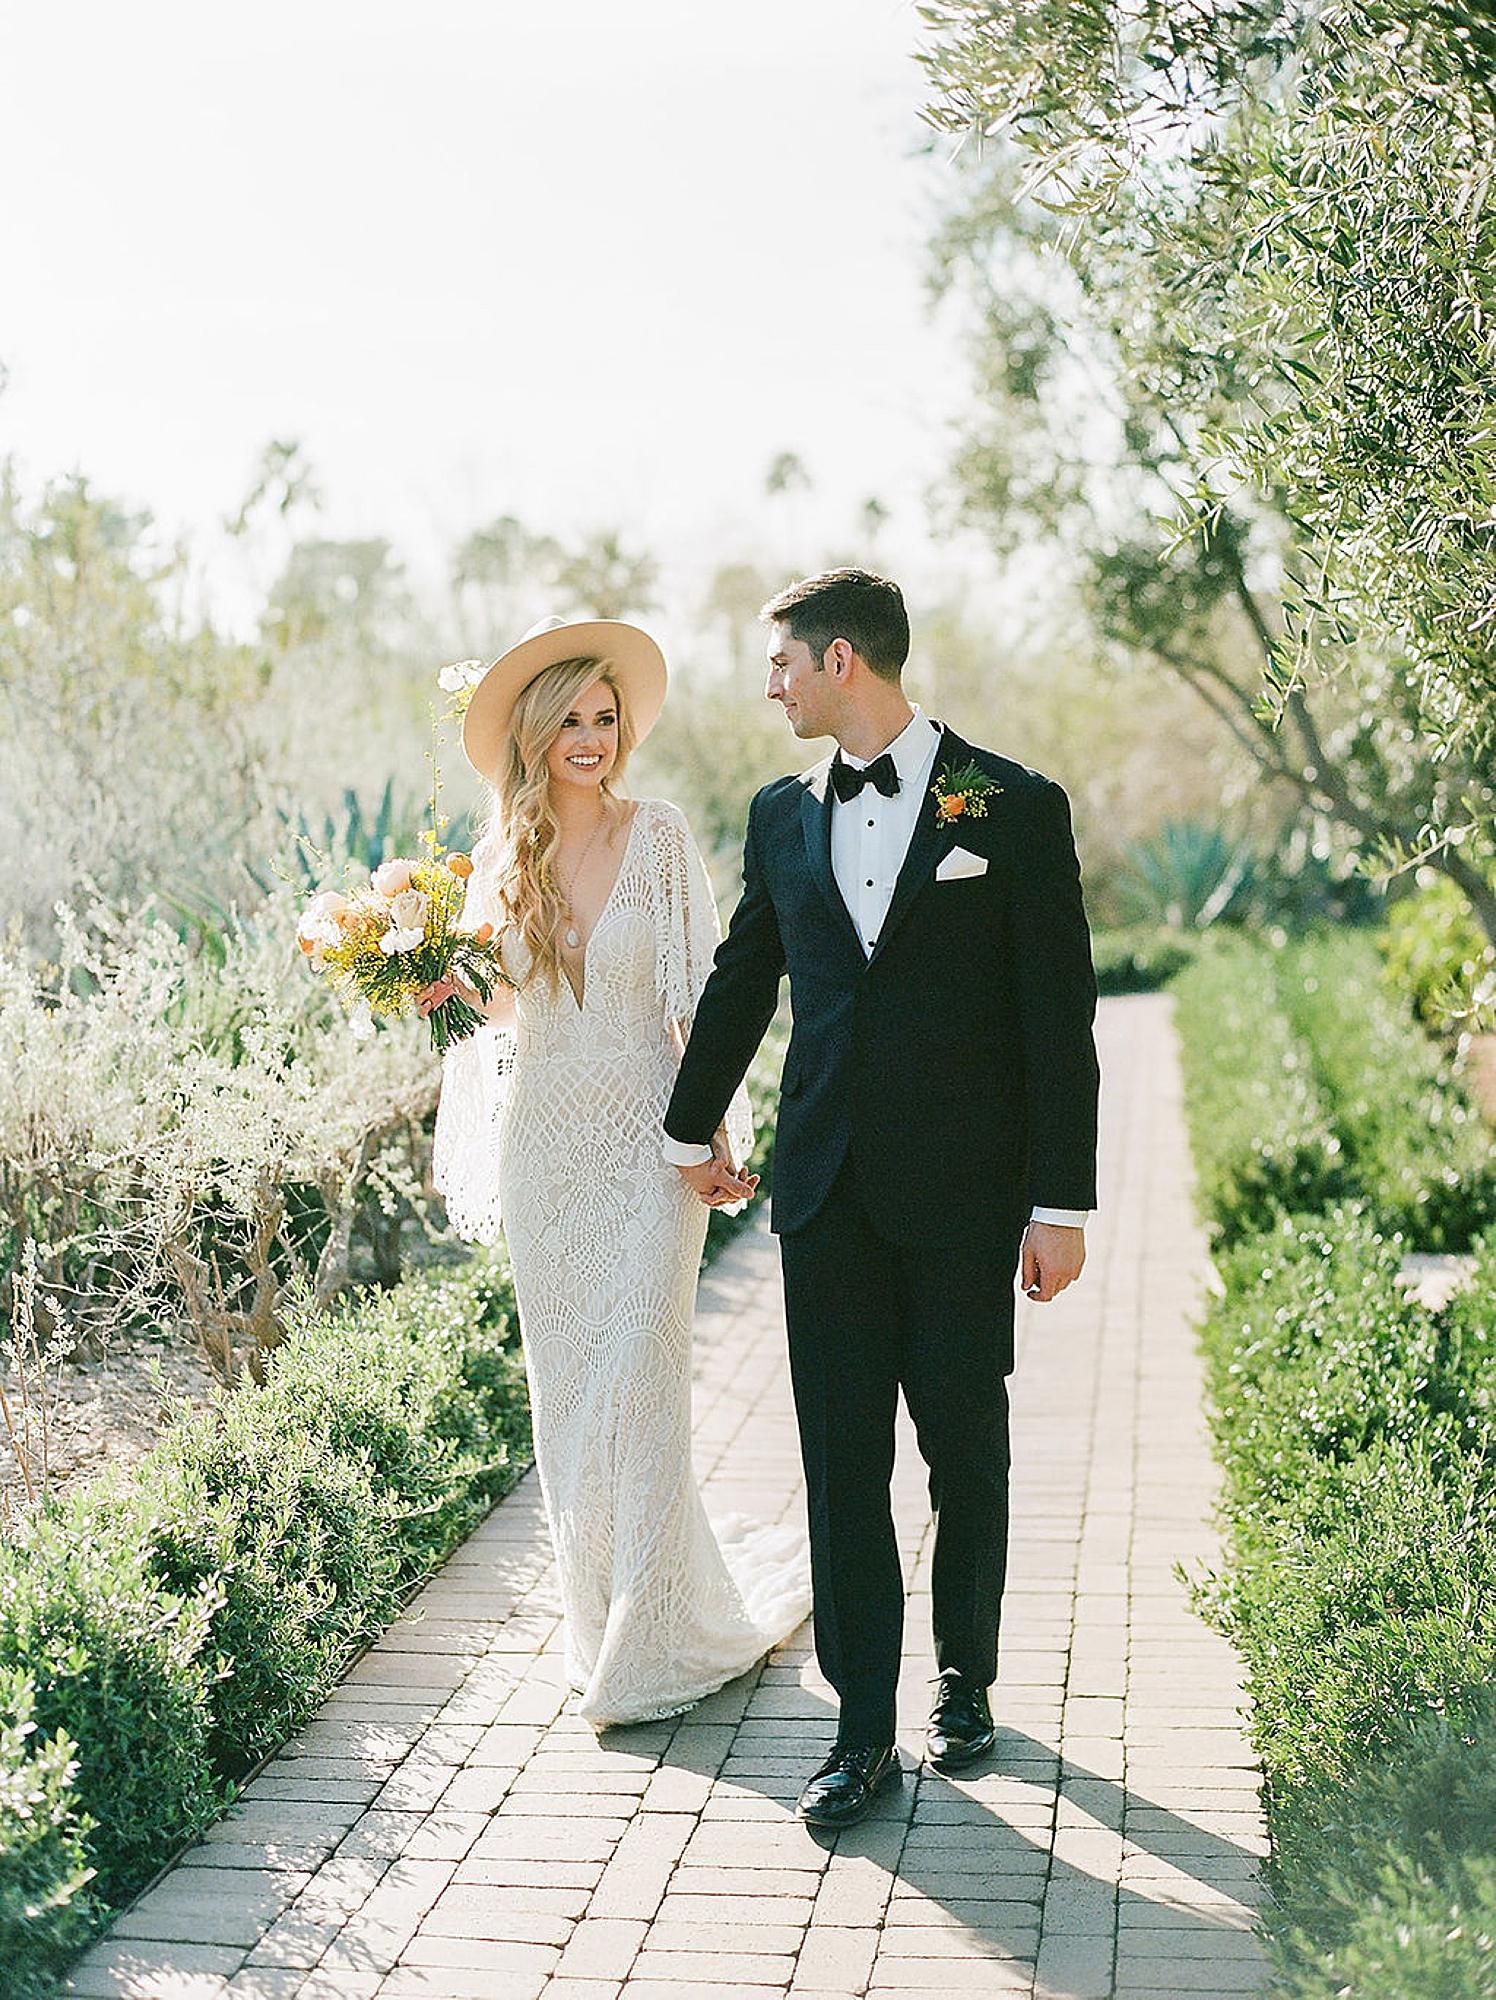 El Chorro Sedona AZ Wedding Photography by Magi Fisher of Magdalena Studios 0025